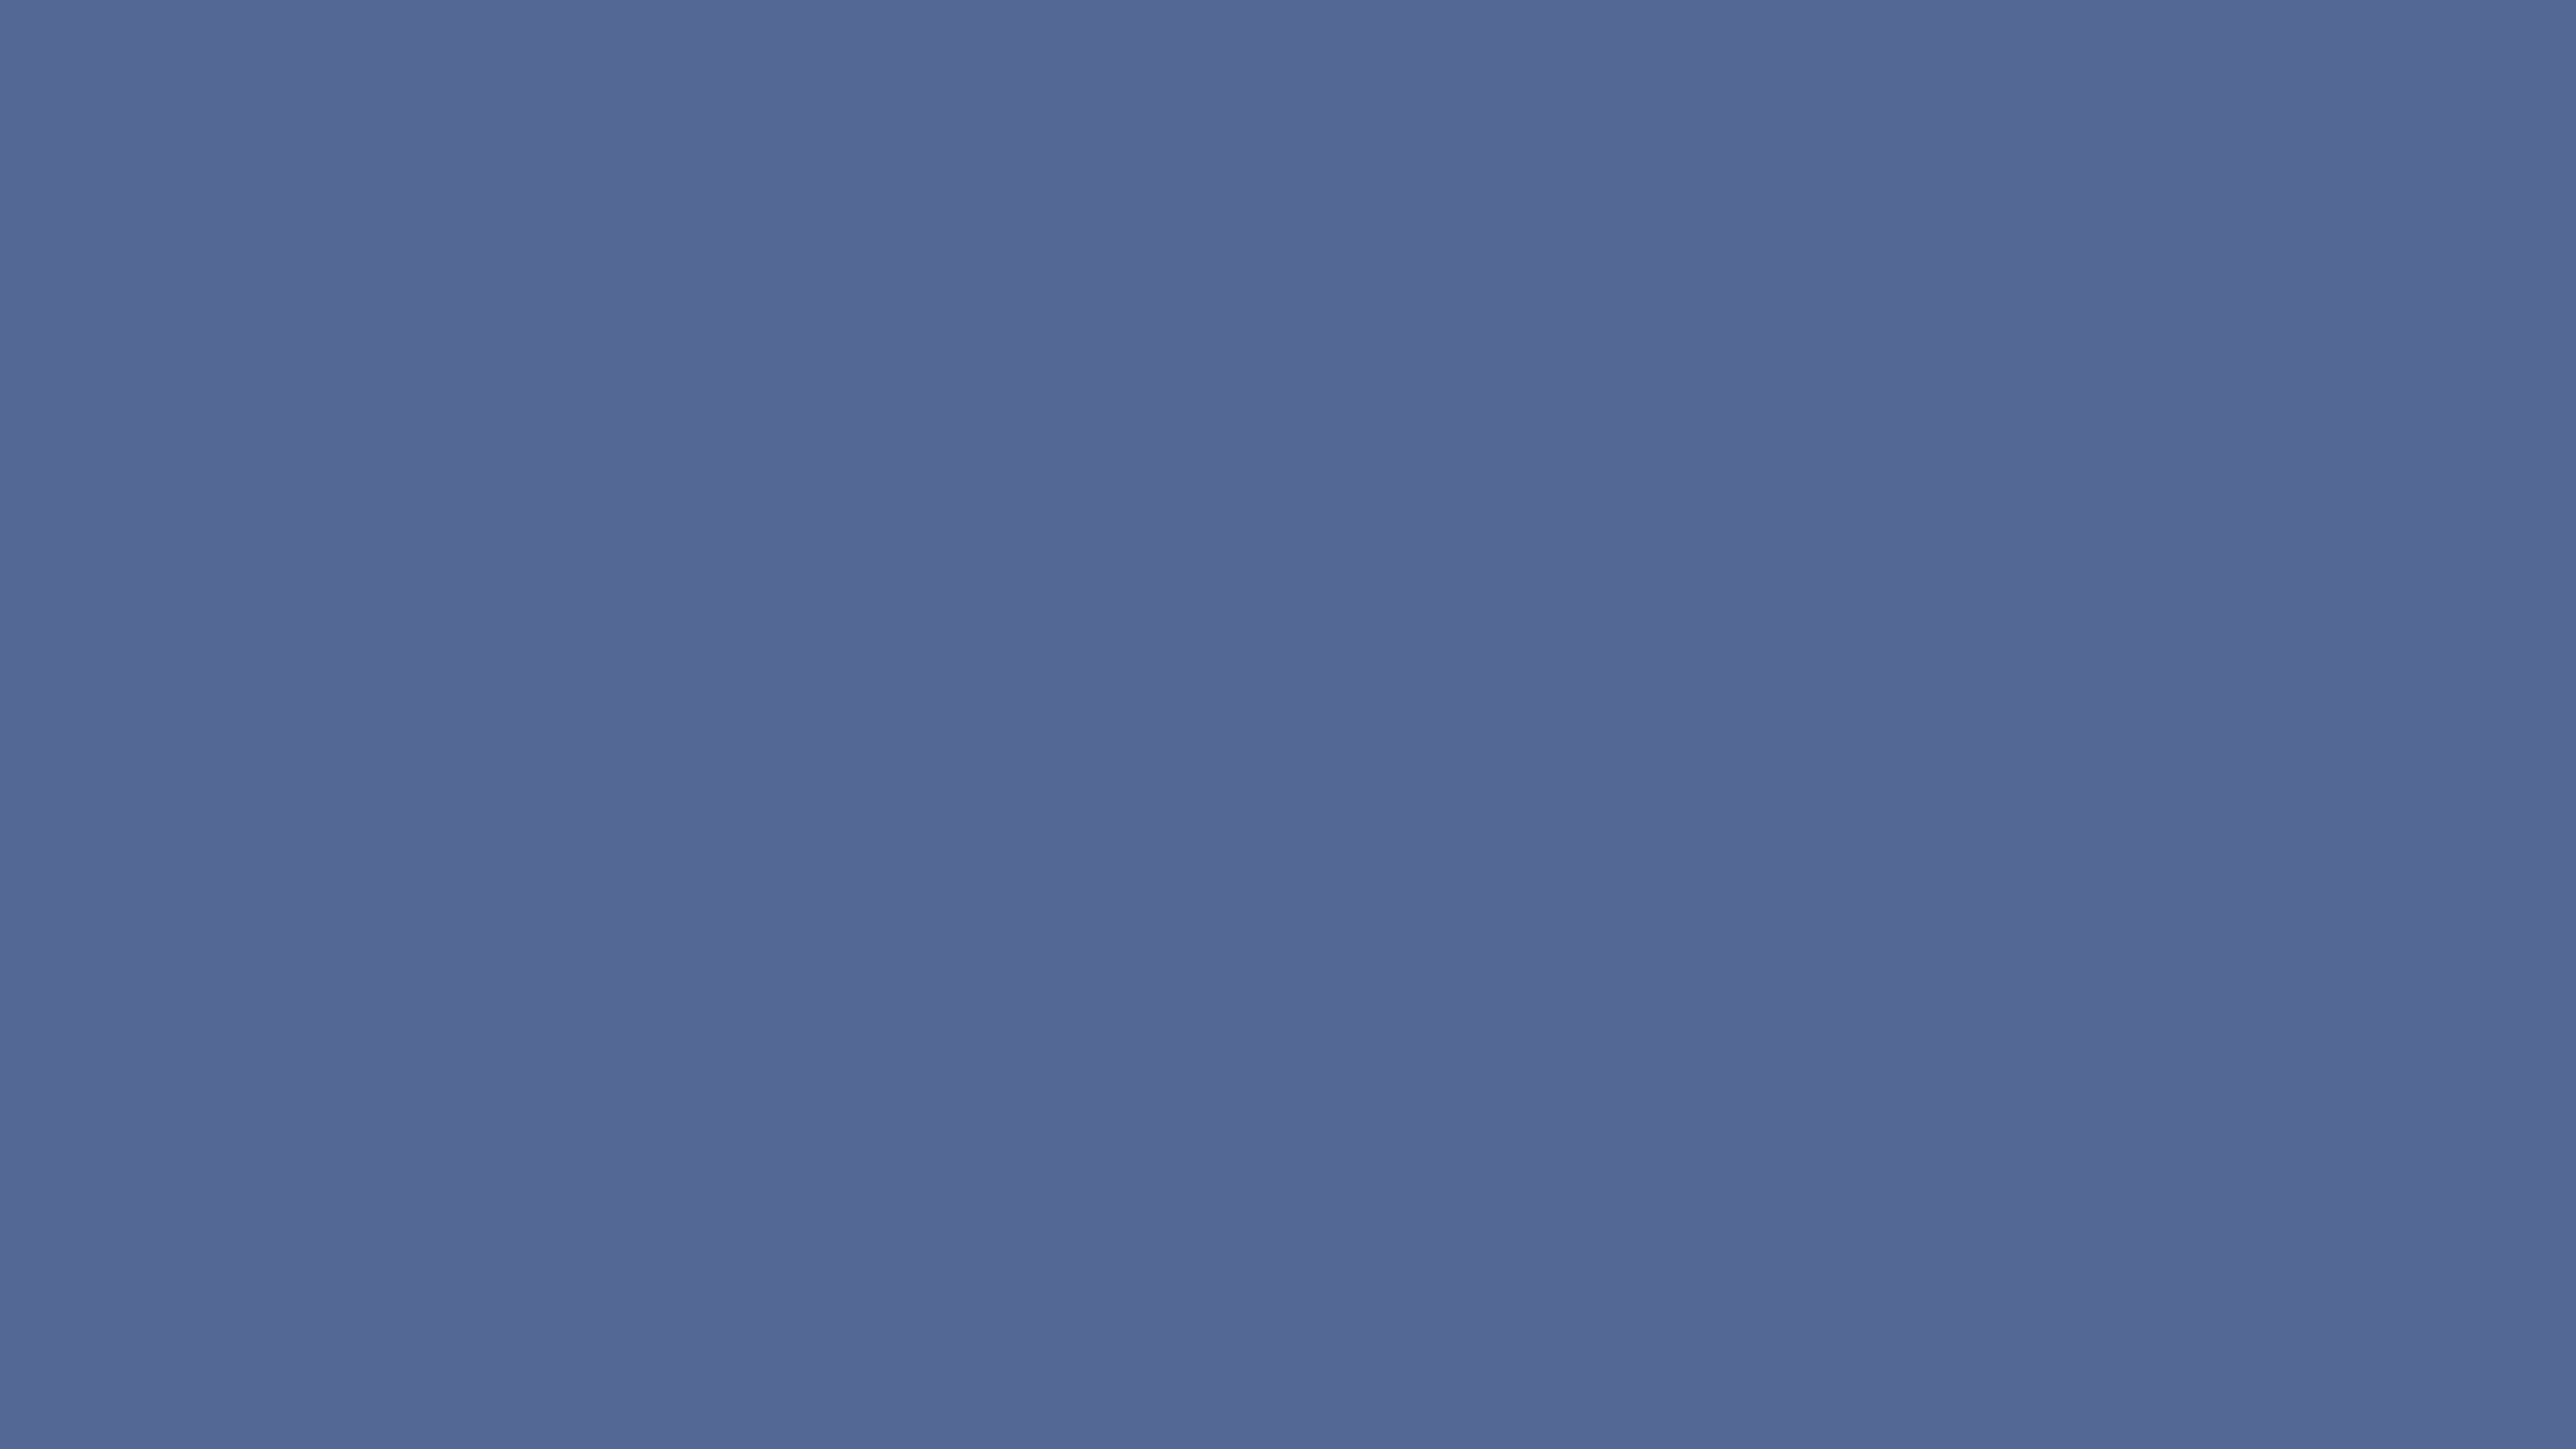 4096x2304 UCLA Blue Solid Color Background